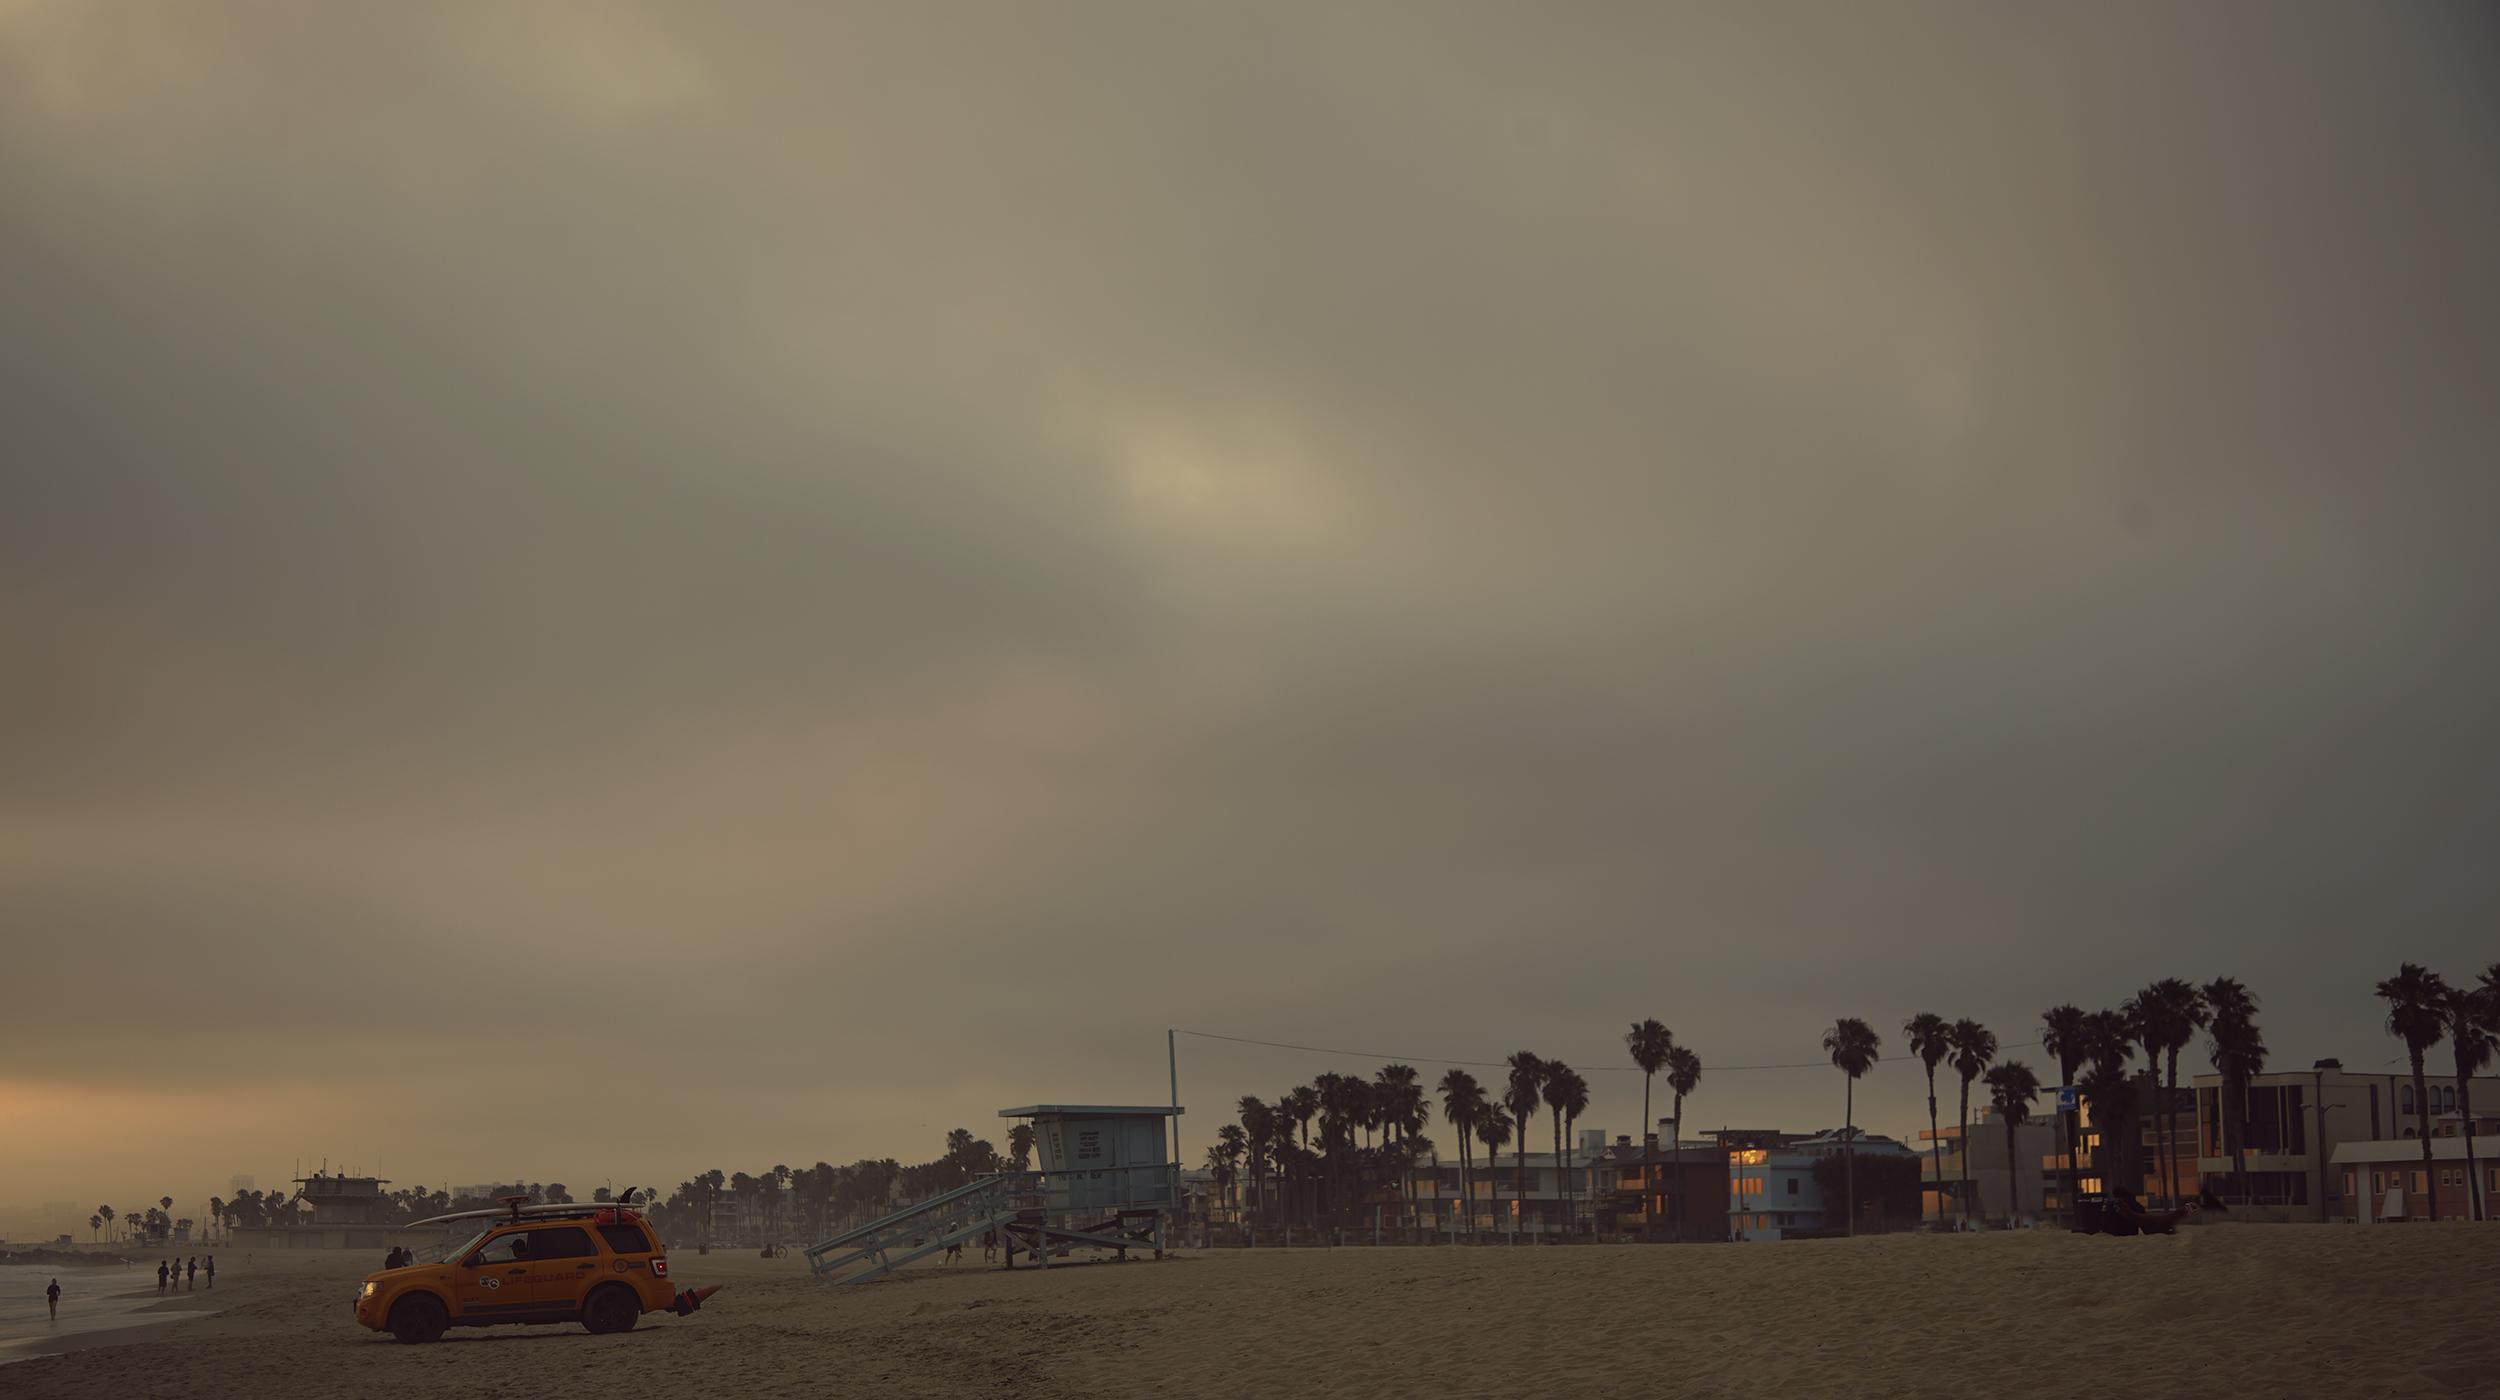 beach lifeguard_MG_9856_2.jpg